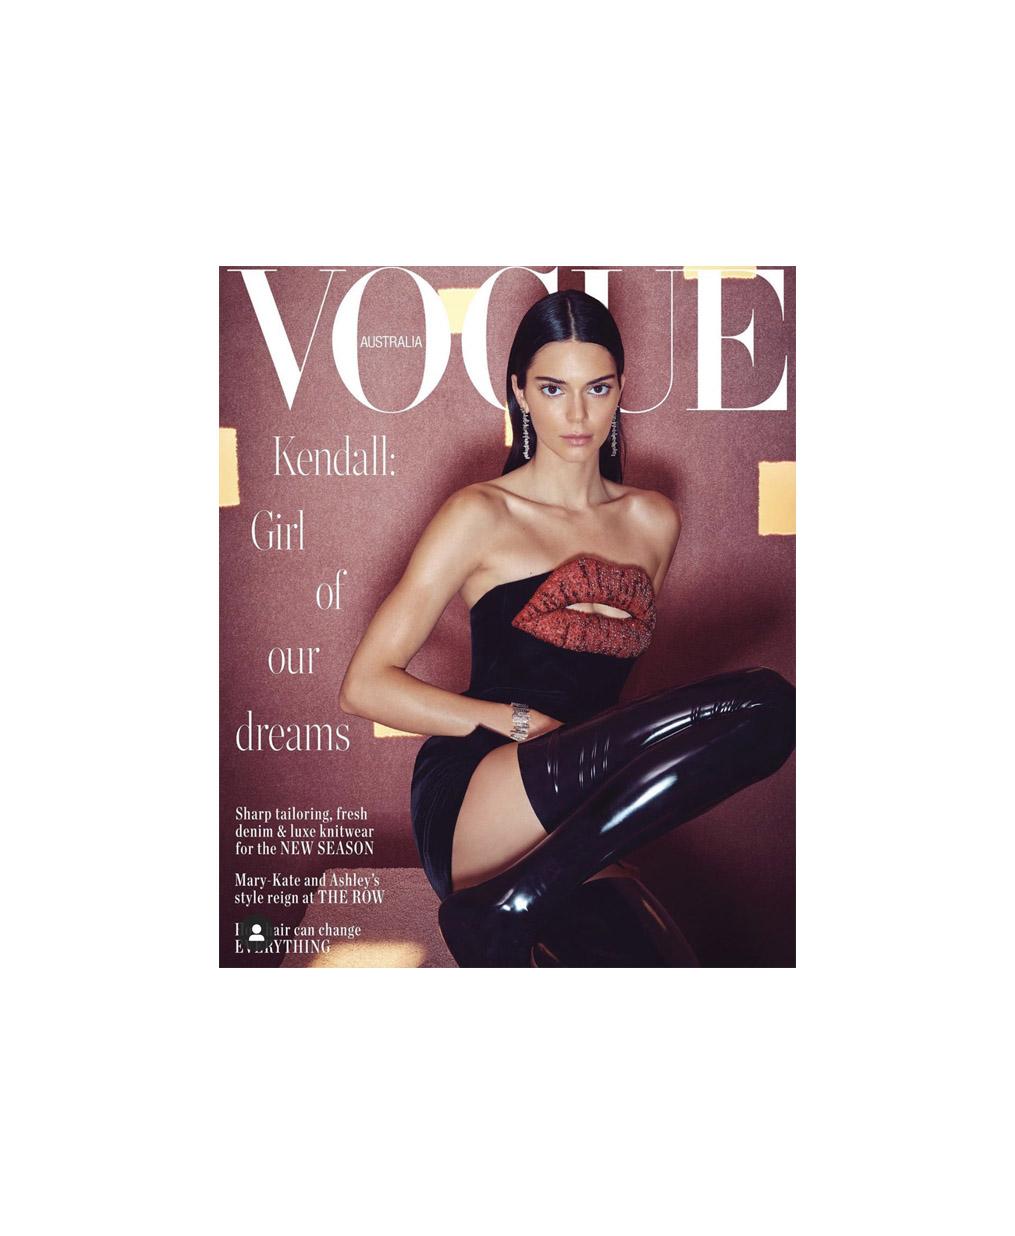 Kendall Jenner for Vogue Australia April Cover 2019